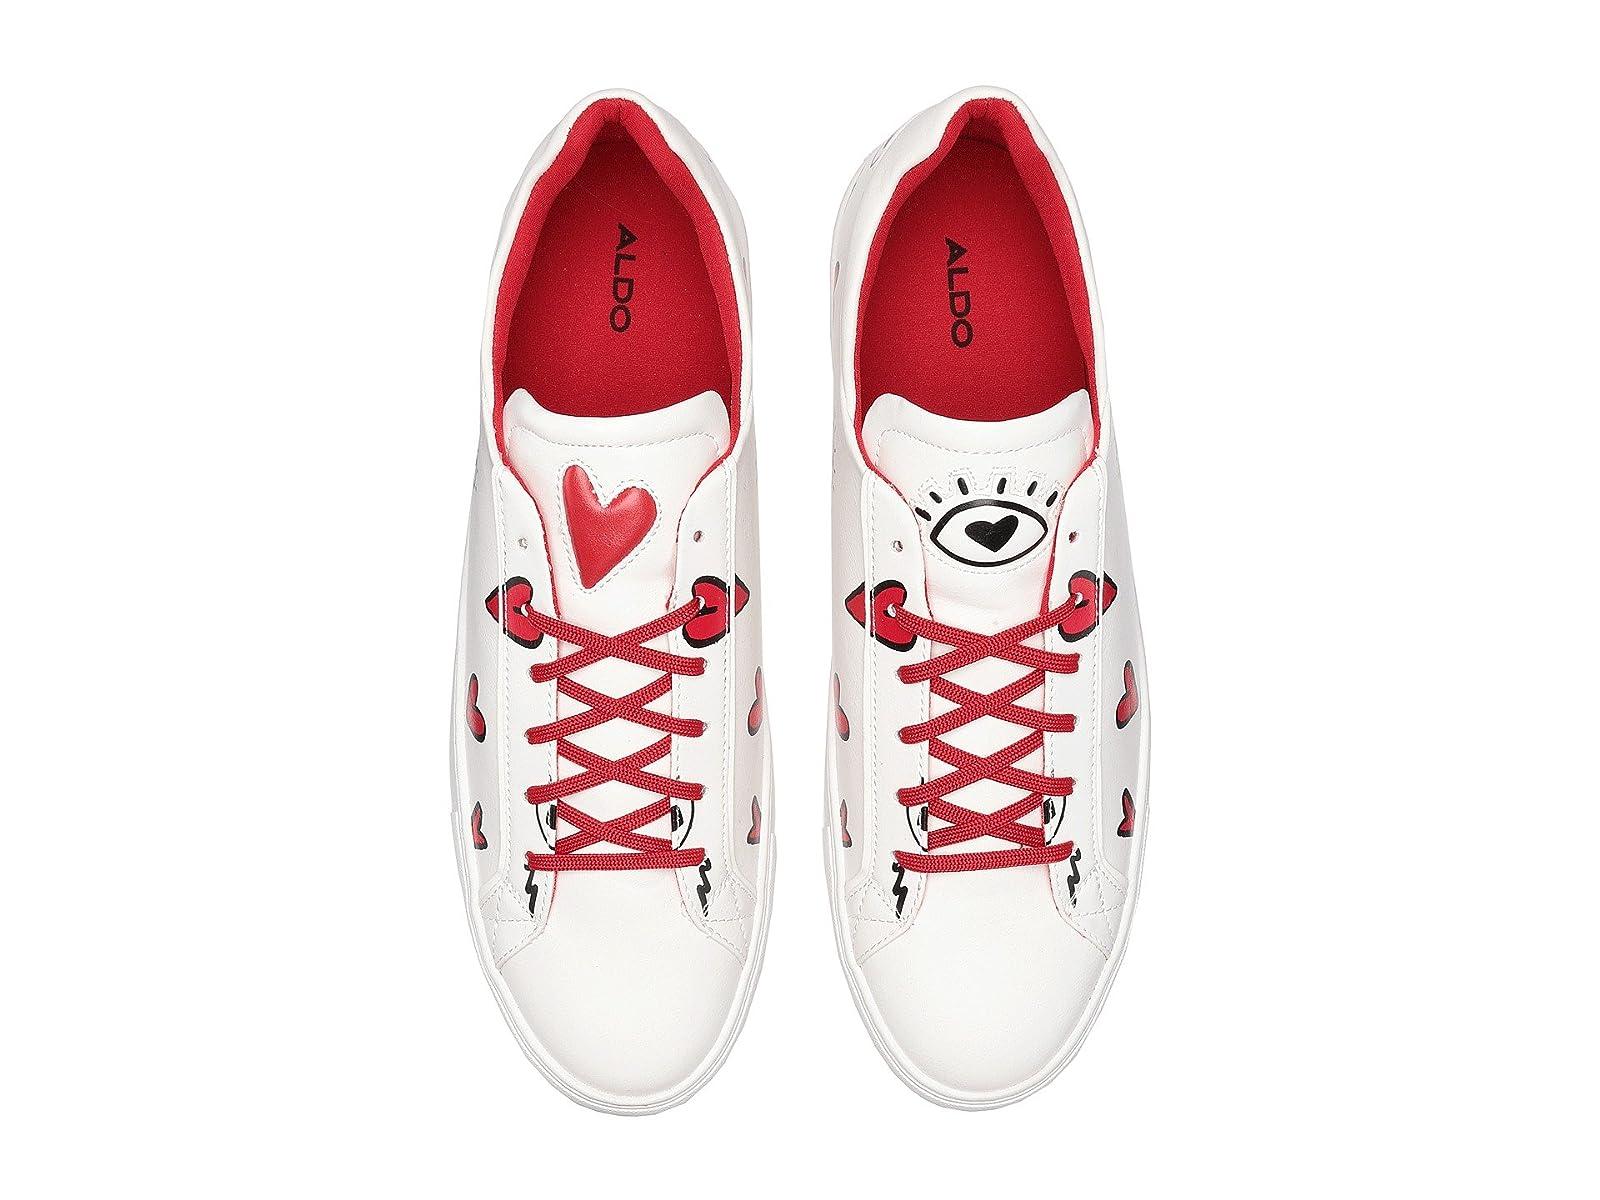 ALDO RoeniaAtmospheric grades have affordable shoes